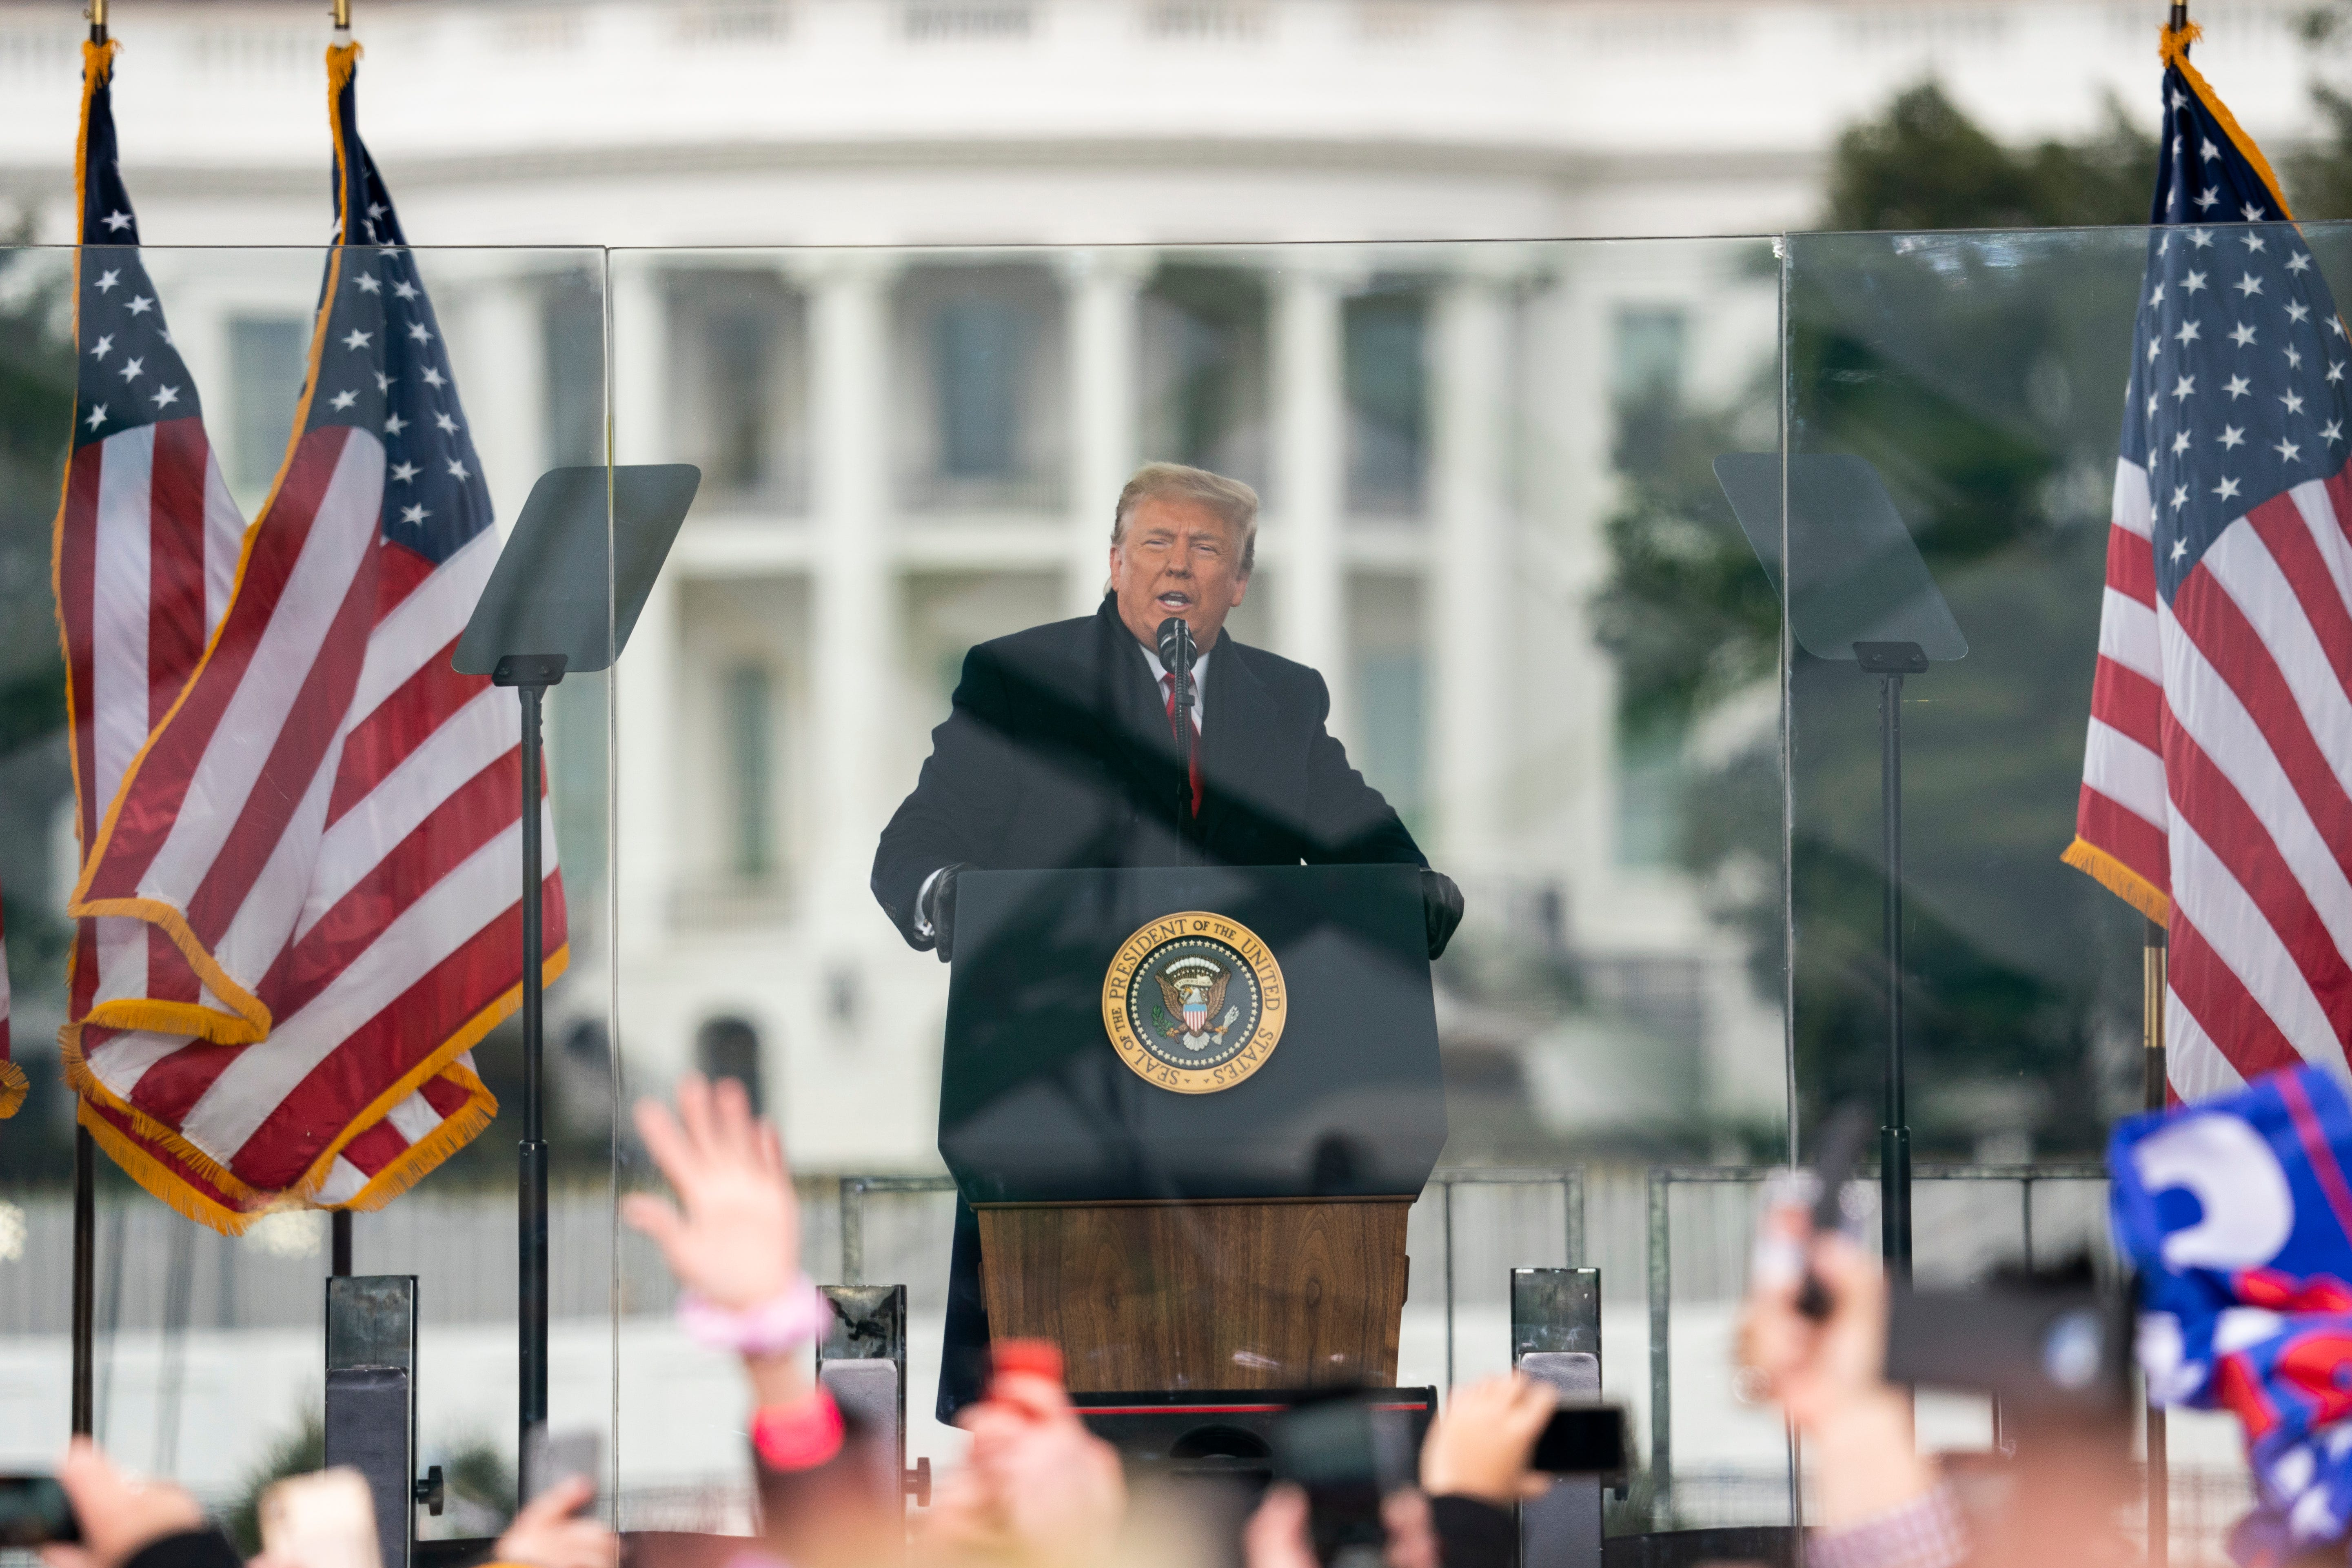 Threat to democracy : Democrats prepare Monday to begin impeachment of Trump over DC riots